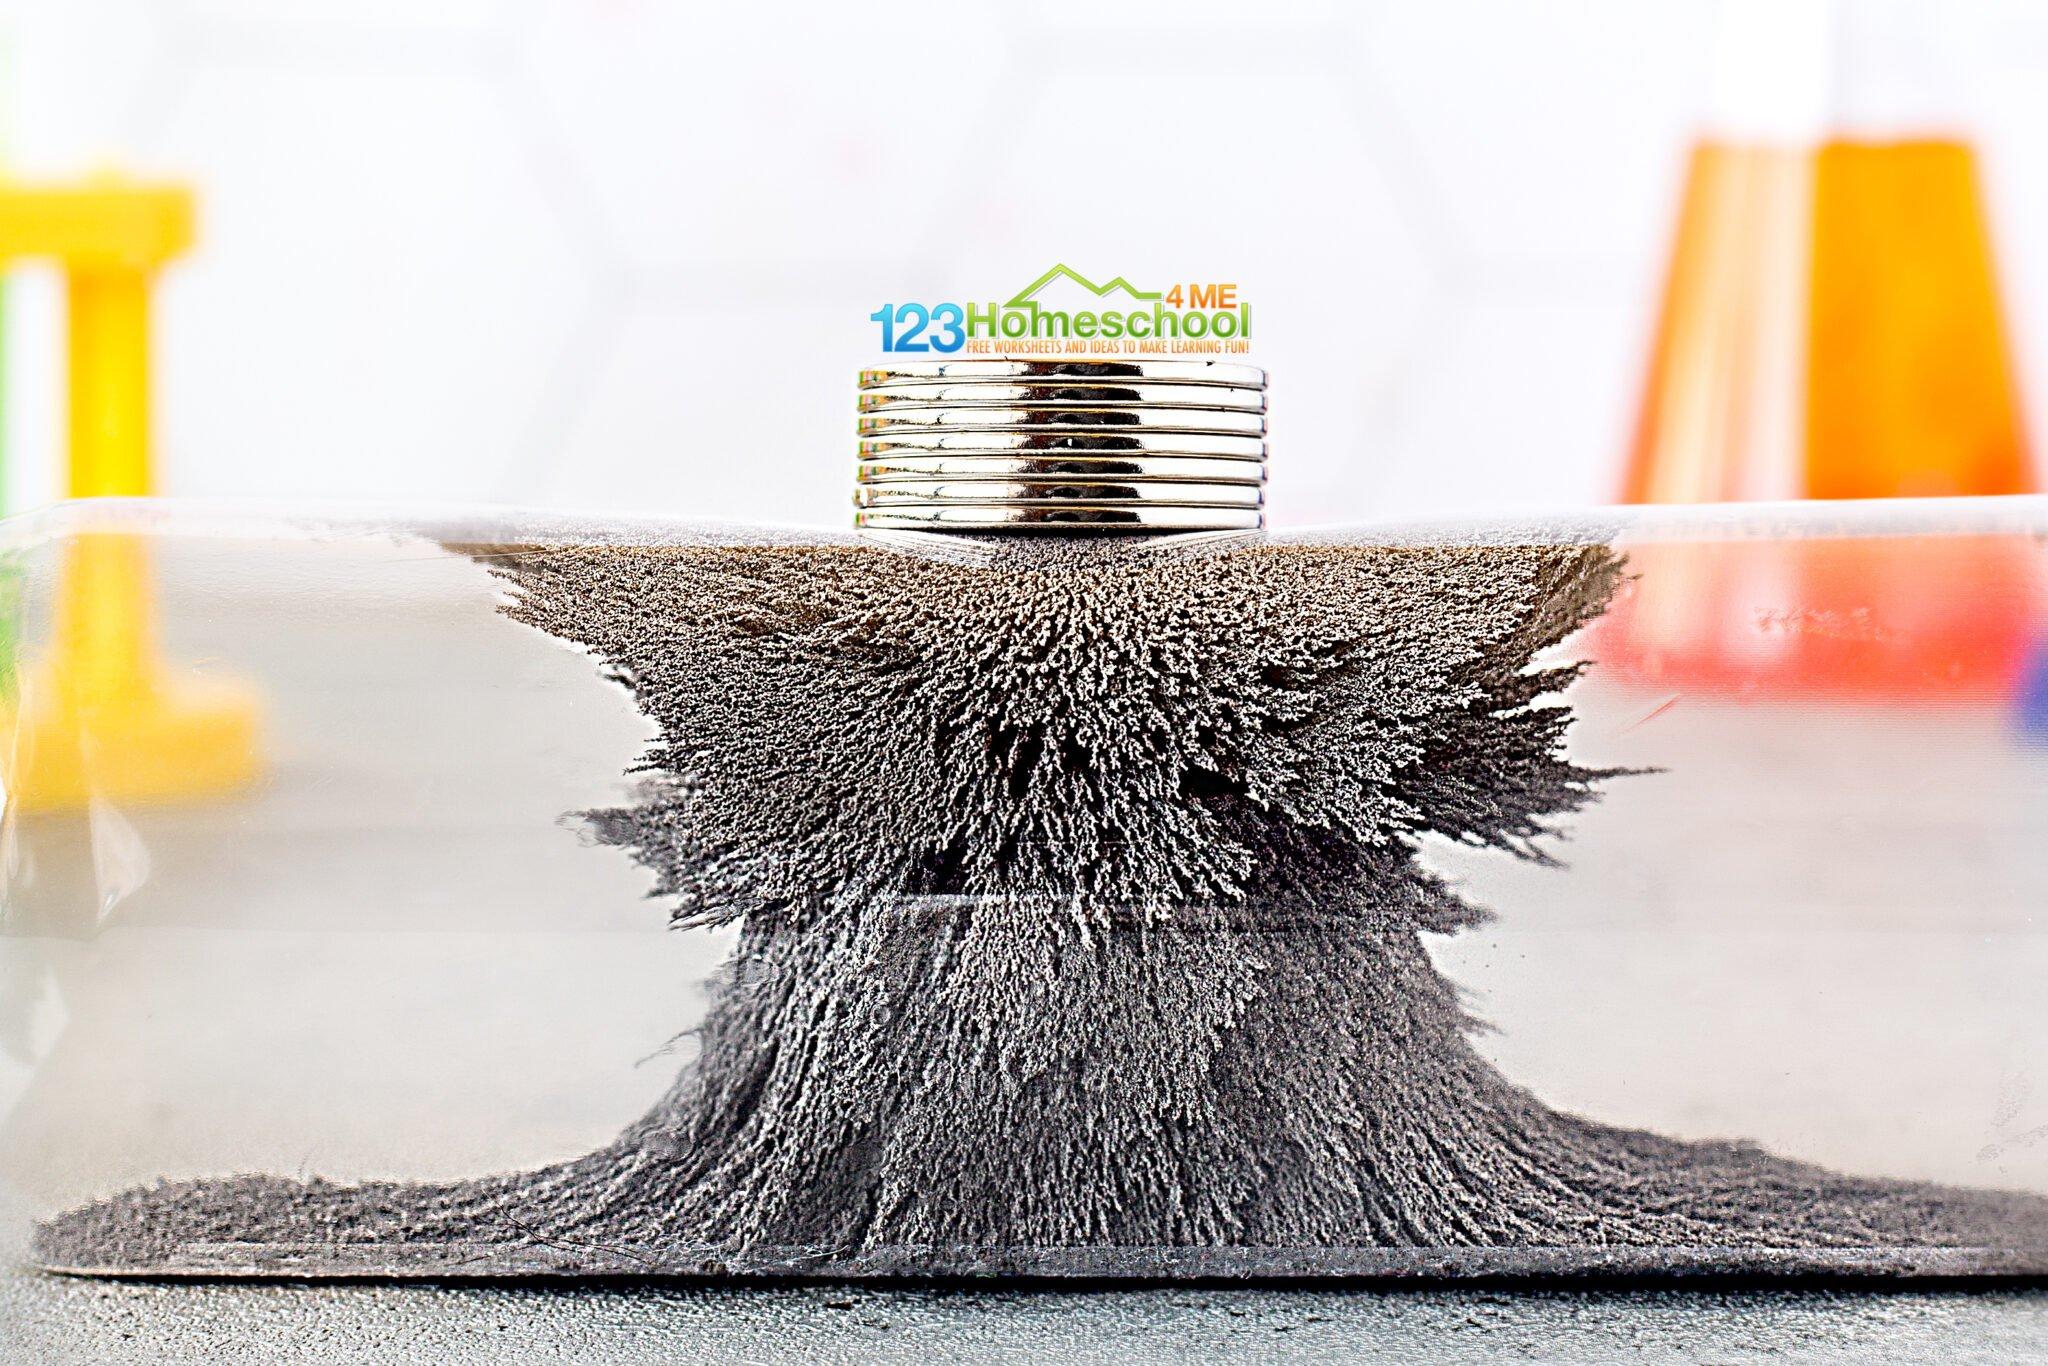 magnet experiment